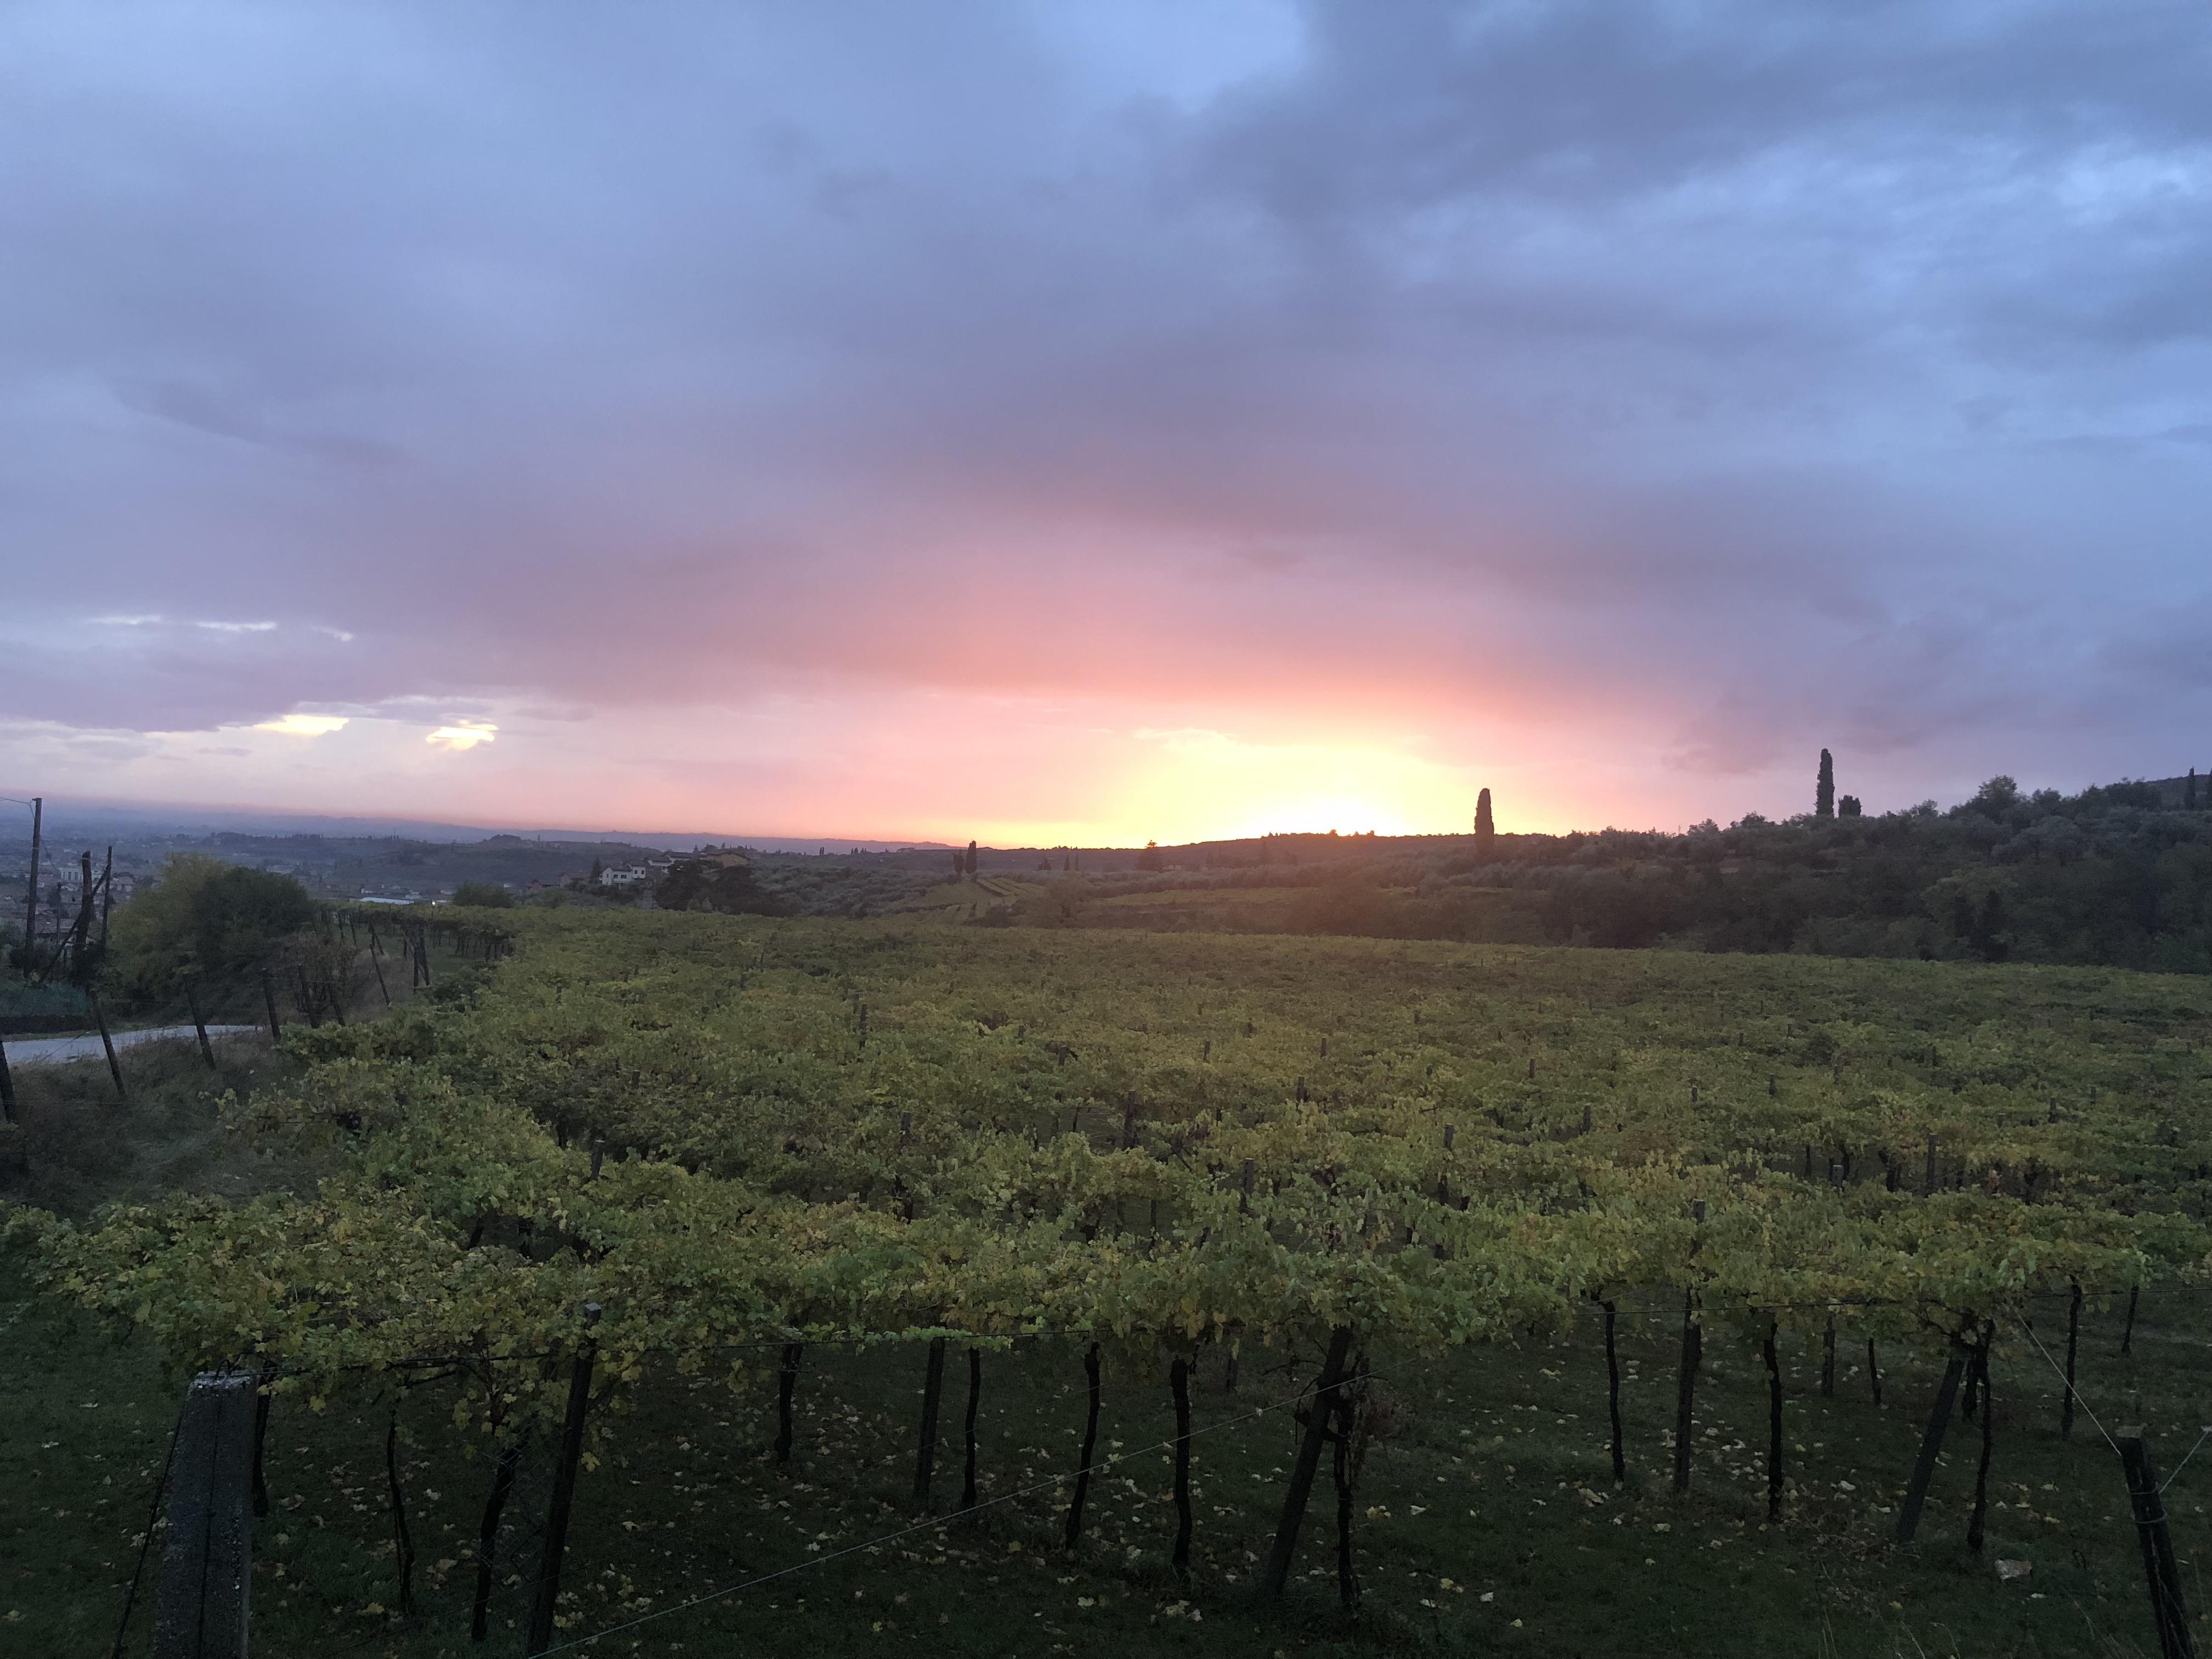 Valpollcella - Italy